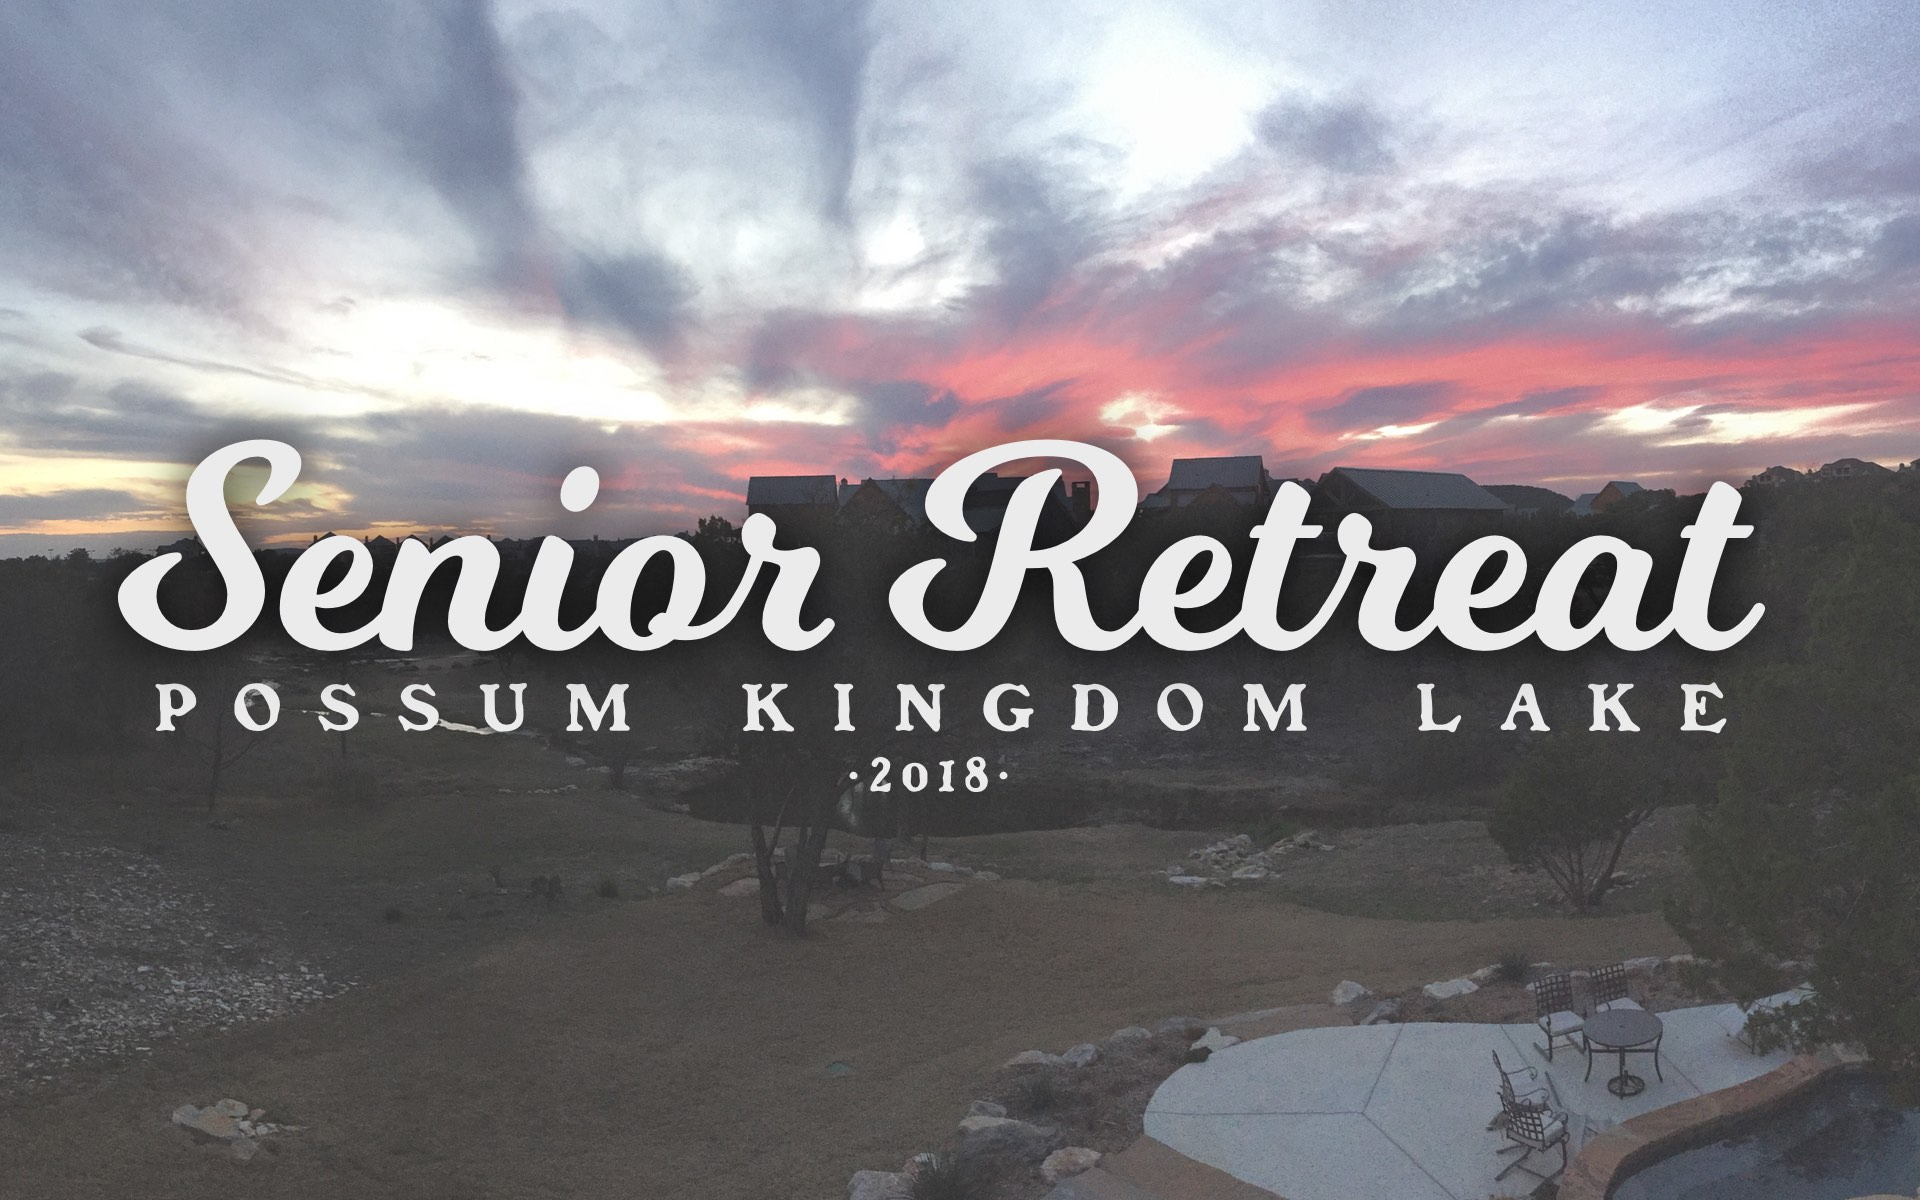 Senior retreat 2018 logo